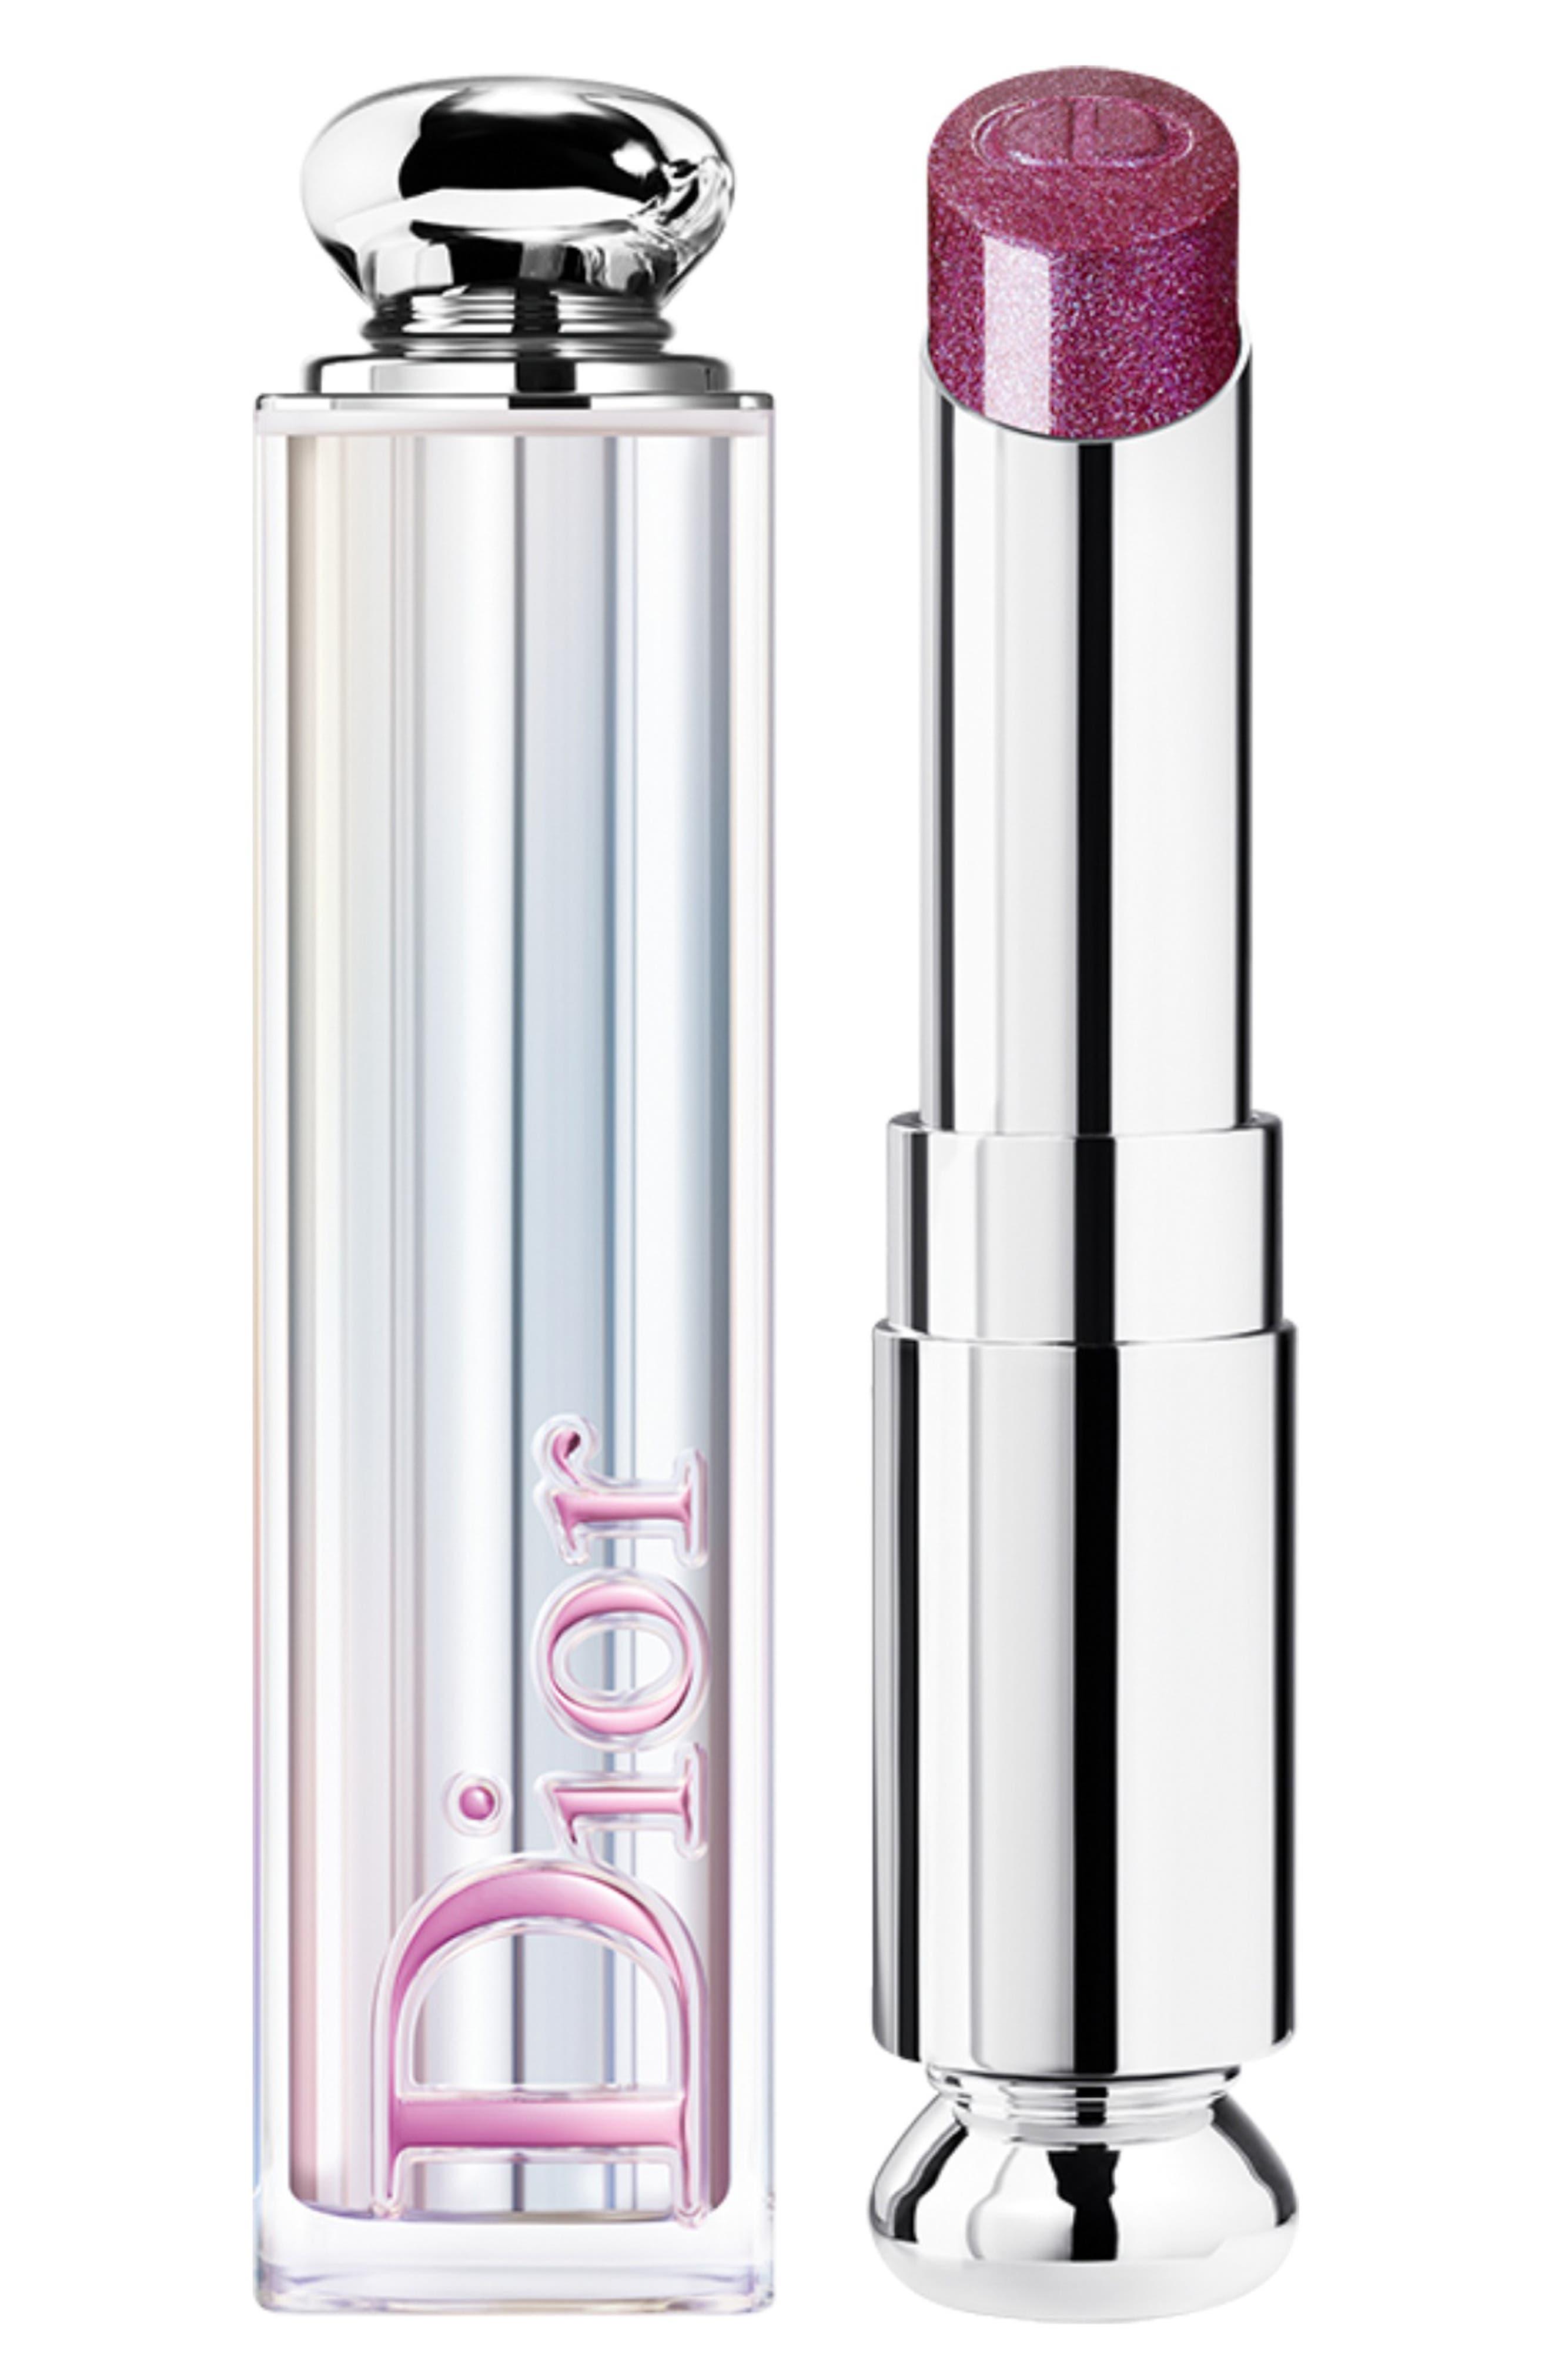 Dior Addict Stellar Shine Lipstick - 891 Diorcelestial